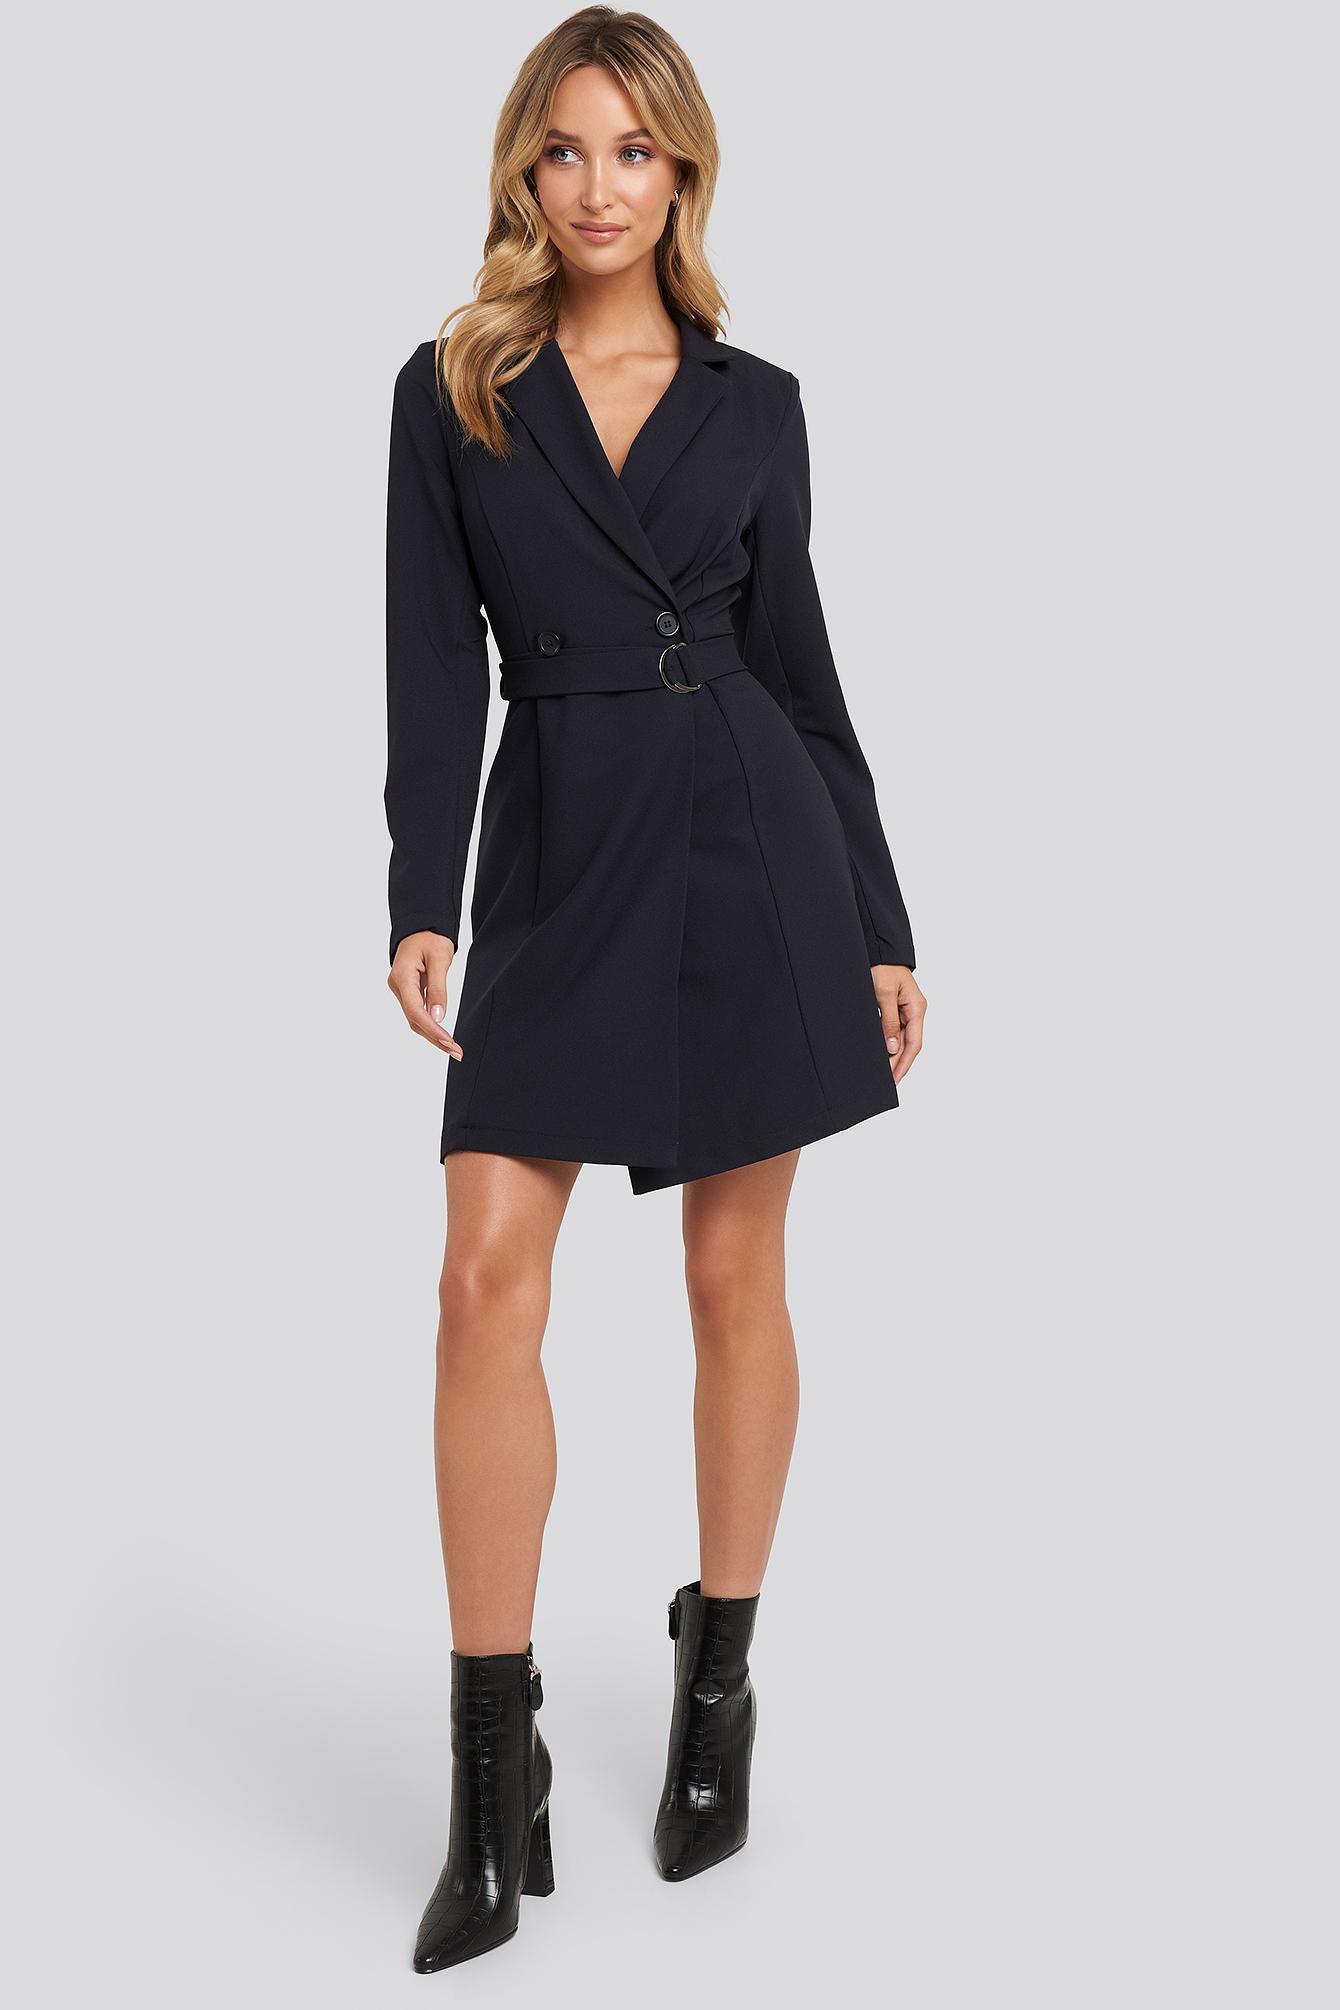 Binding Detailed Blazer Dress Synthétique Trendyol en coloris Bleu